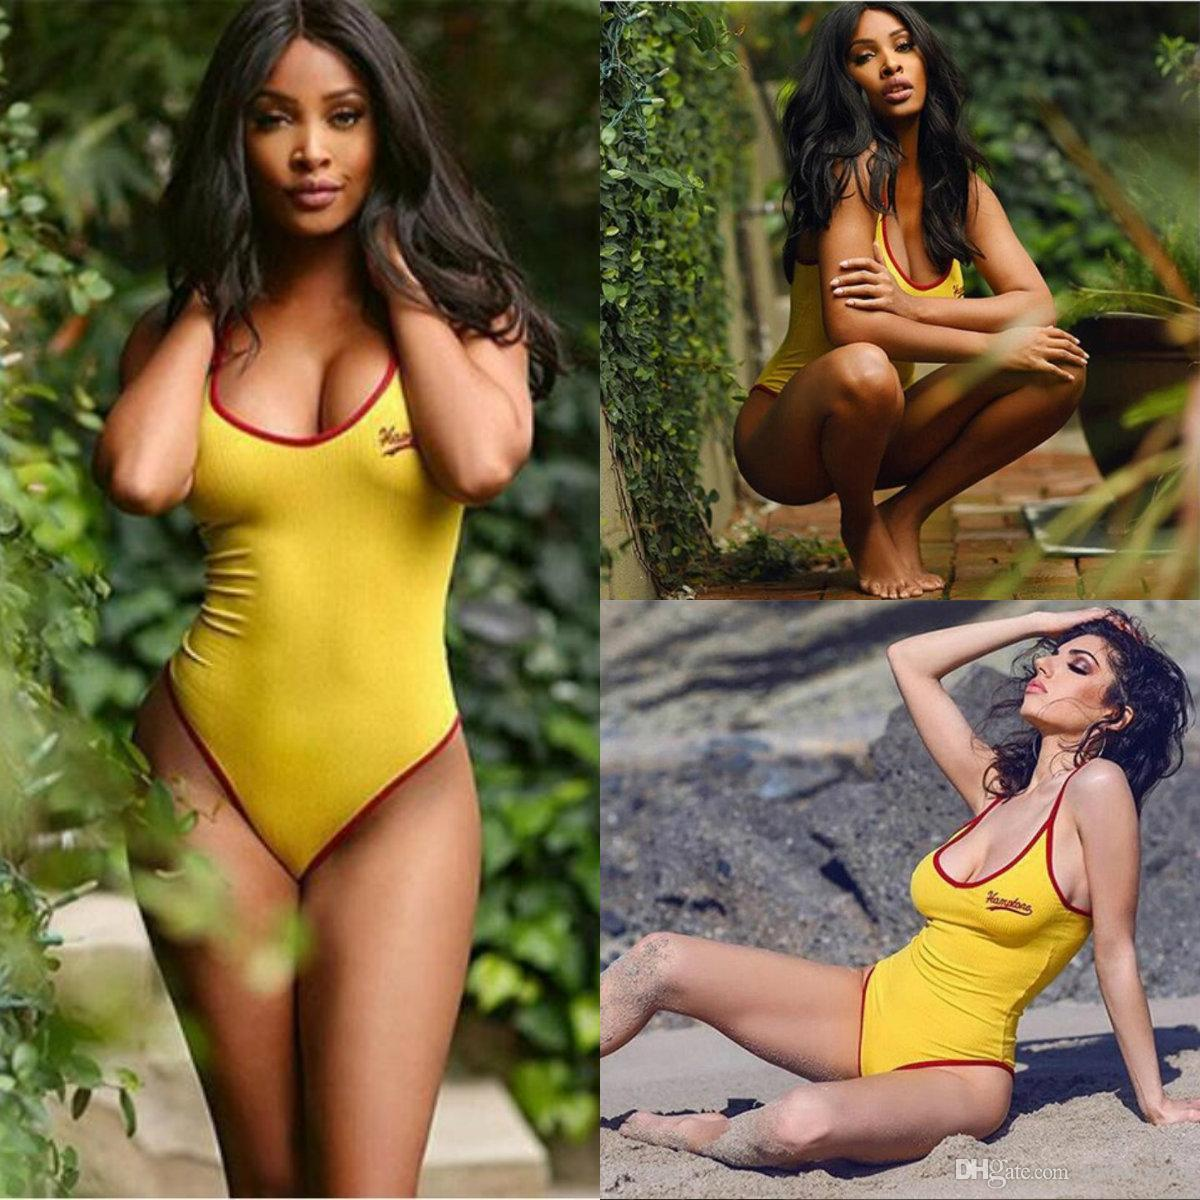 New Arrival Bikini 2018 Summer Beach Yellow Spaghetti Jumpsuit Real Image Womens Bikini Swimwear Fast Shipping In Stock